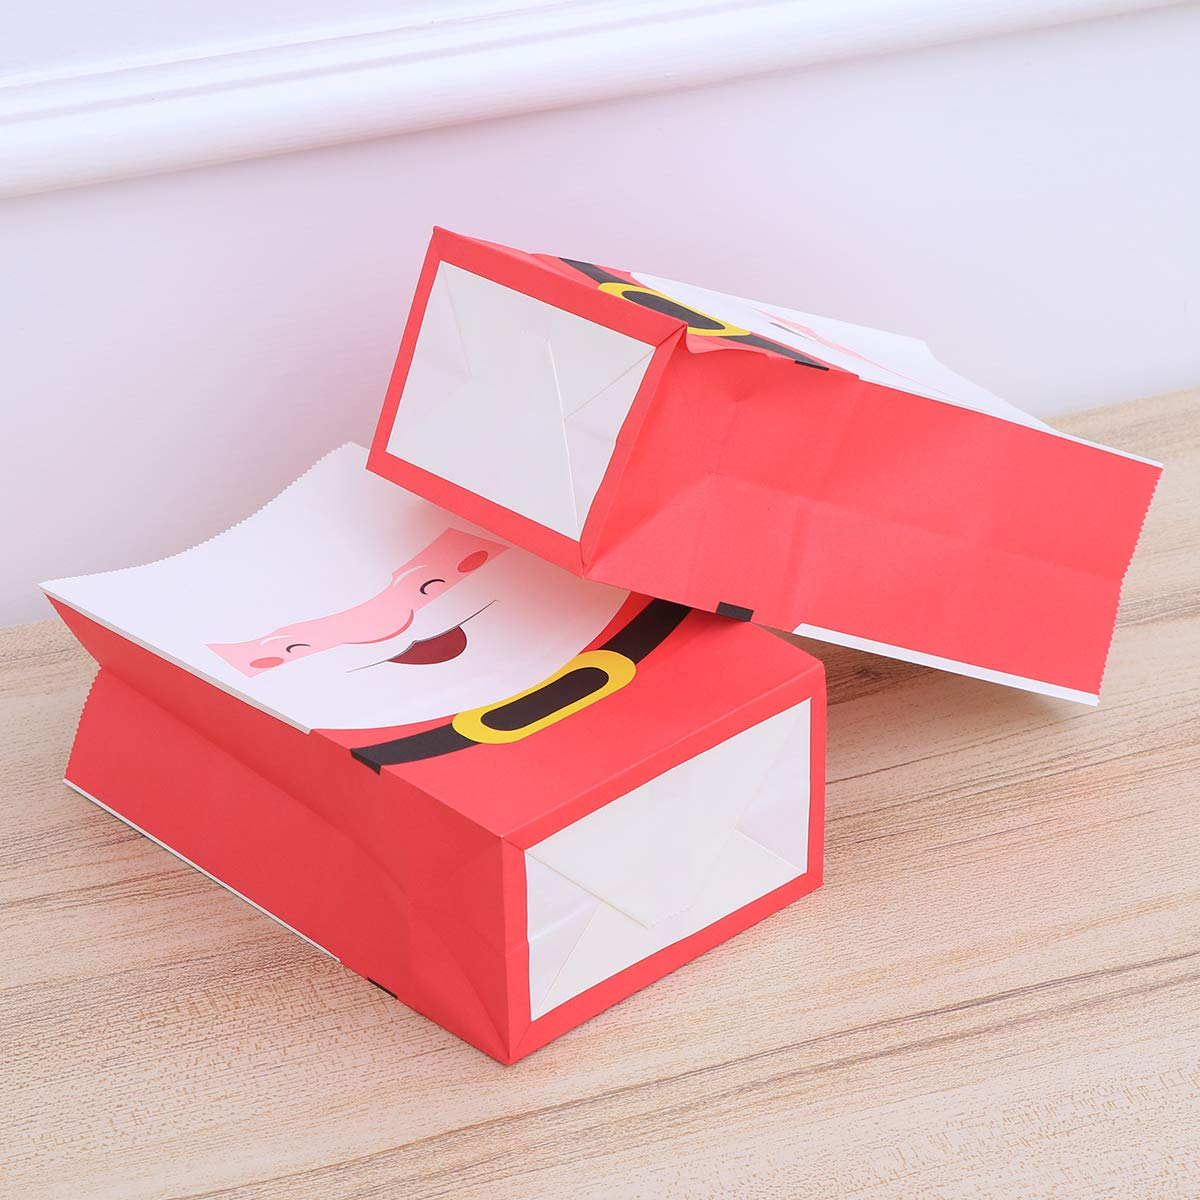 STOBOK No/ël Santa Kraft Papier Sac Cadeau Coffret G/âter Boites De Noel Fav 24pcs